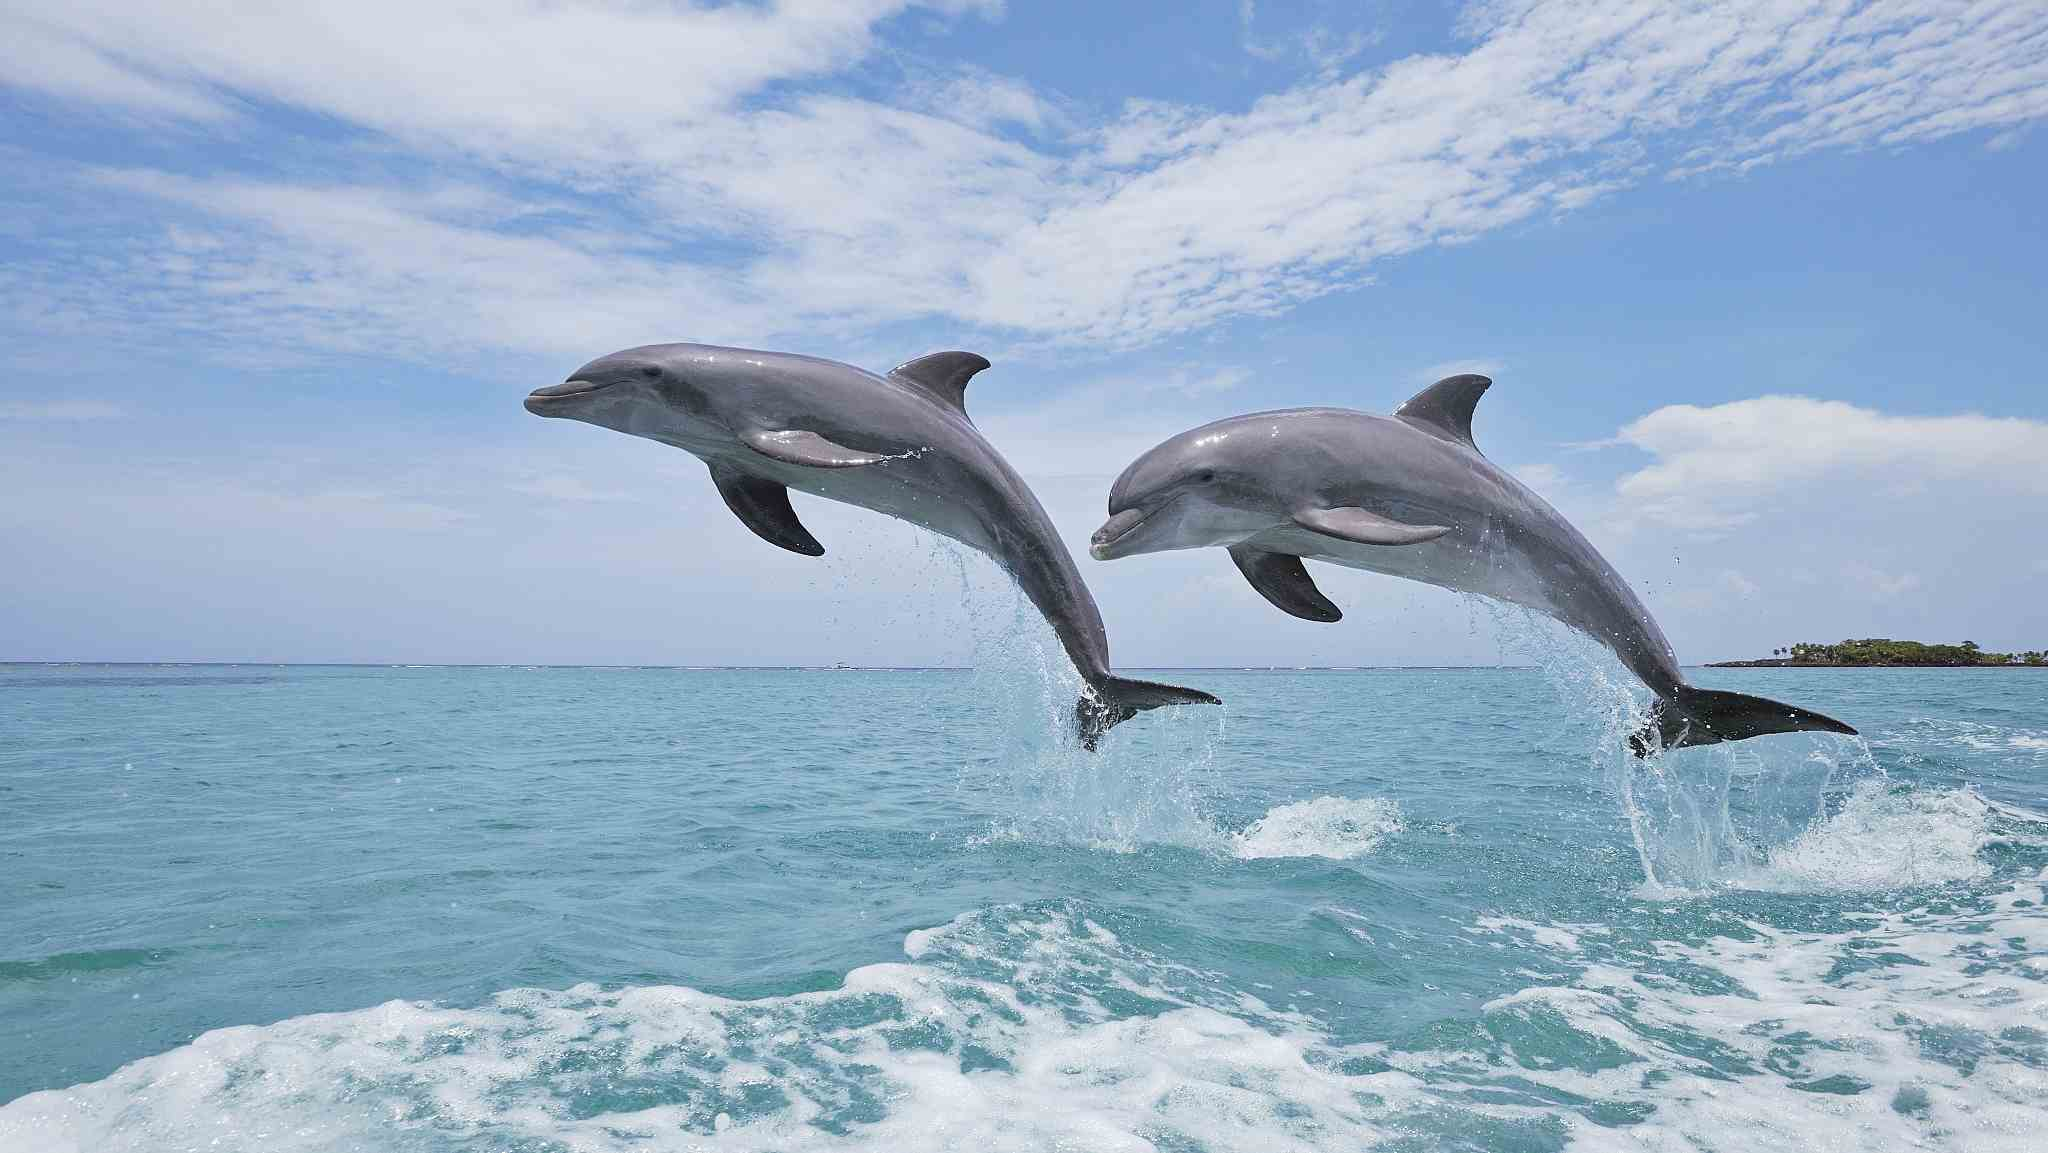 Dolphins form social circles based on similar reproductive status: Study